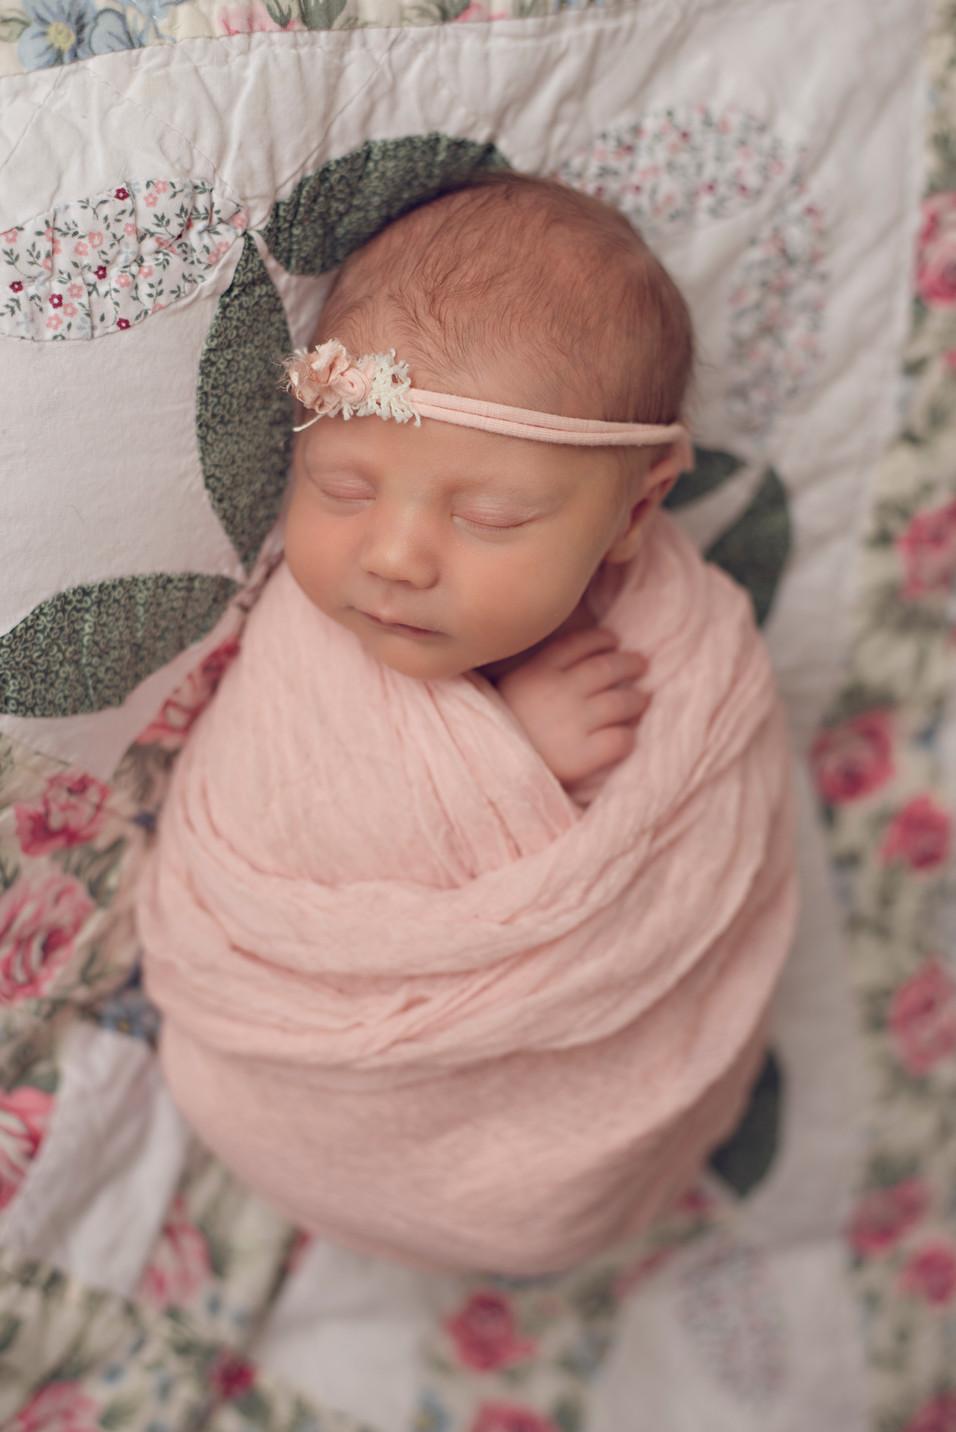 Baby Inezmay